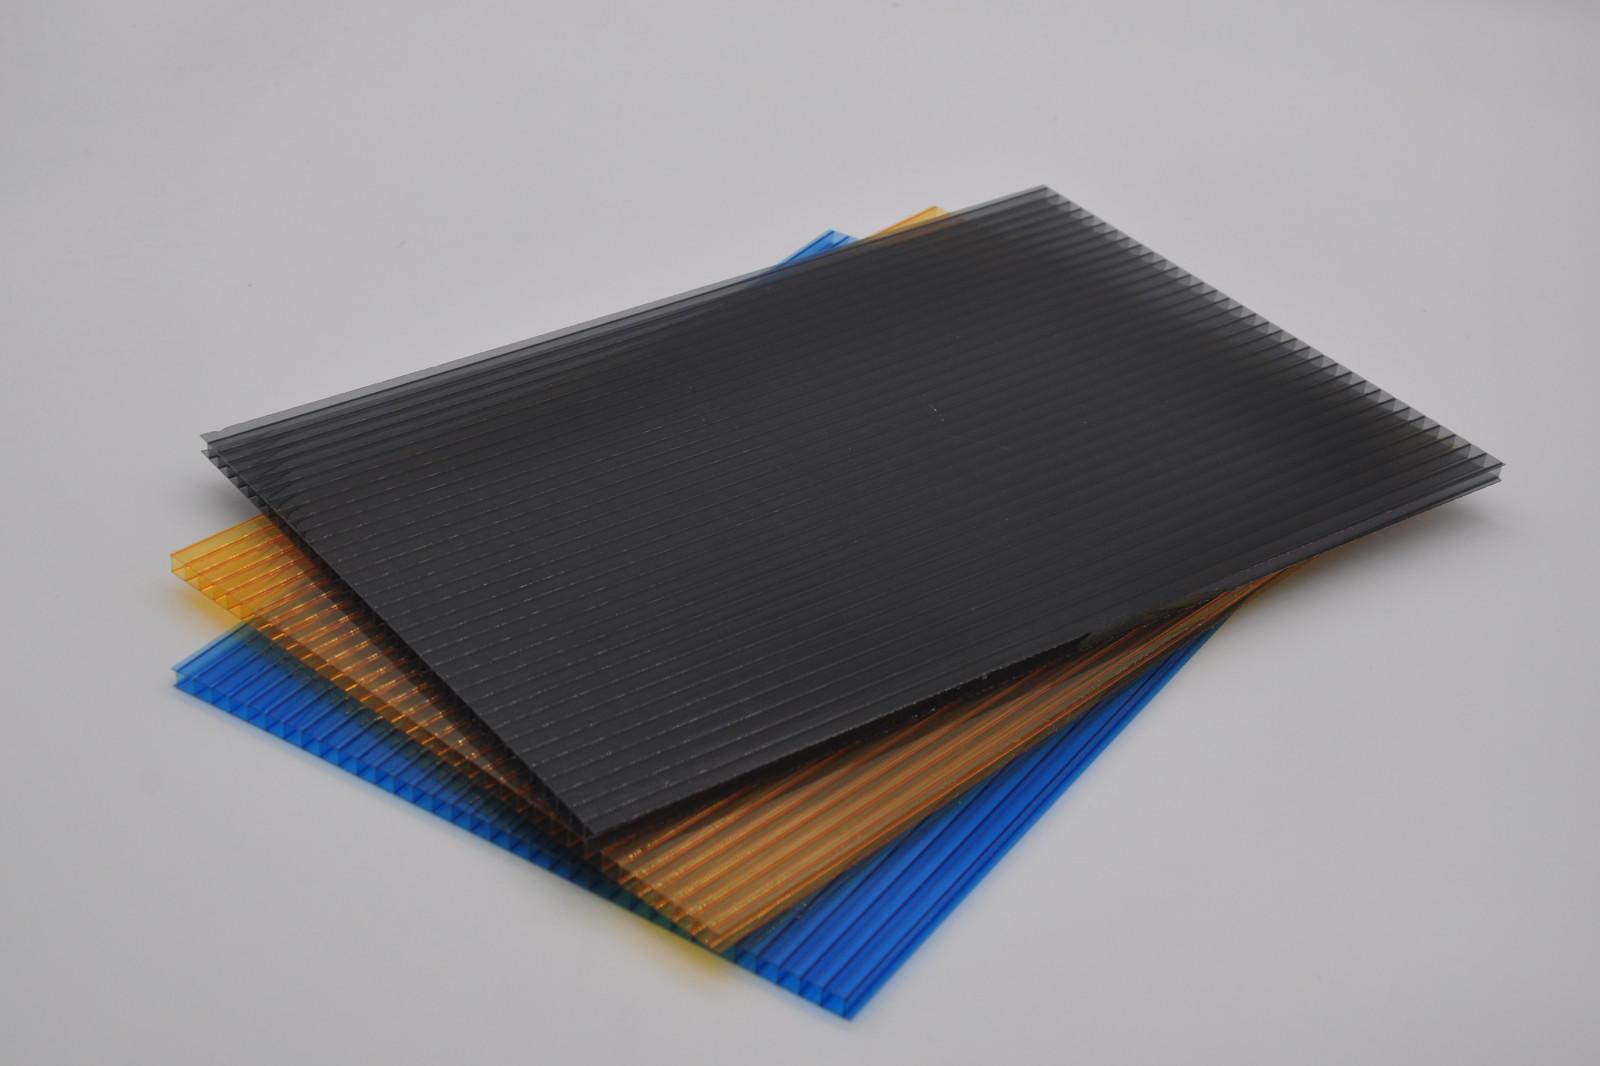 GWX uv protective polycarbonate pc sheet factory direct for Gazebo-3